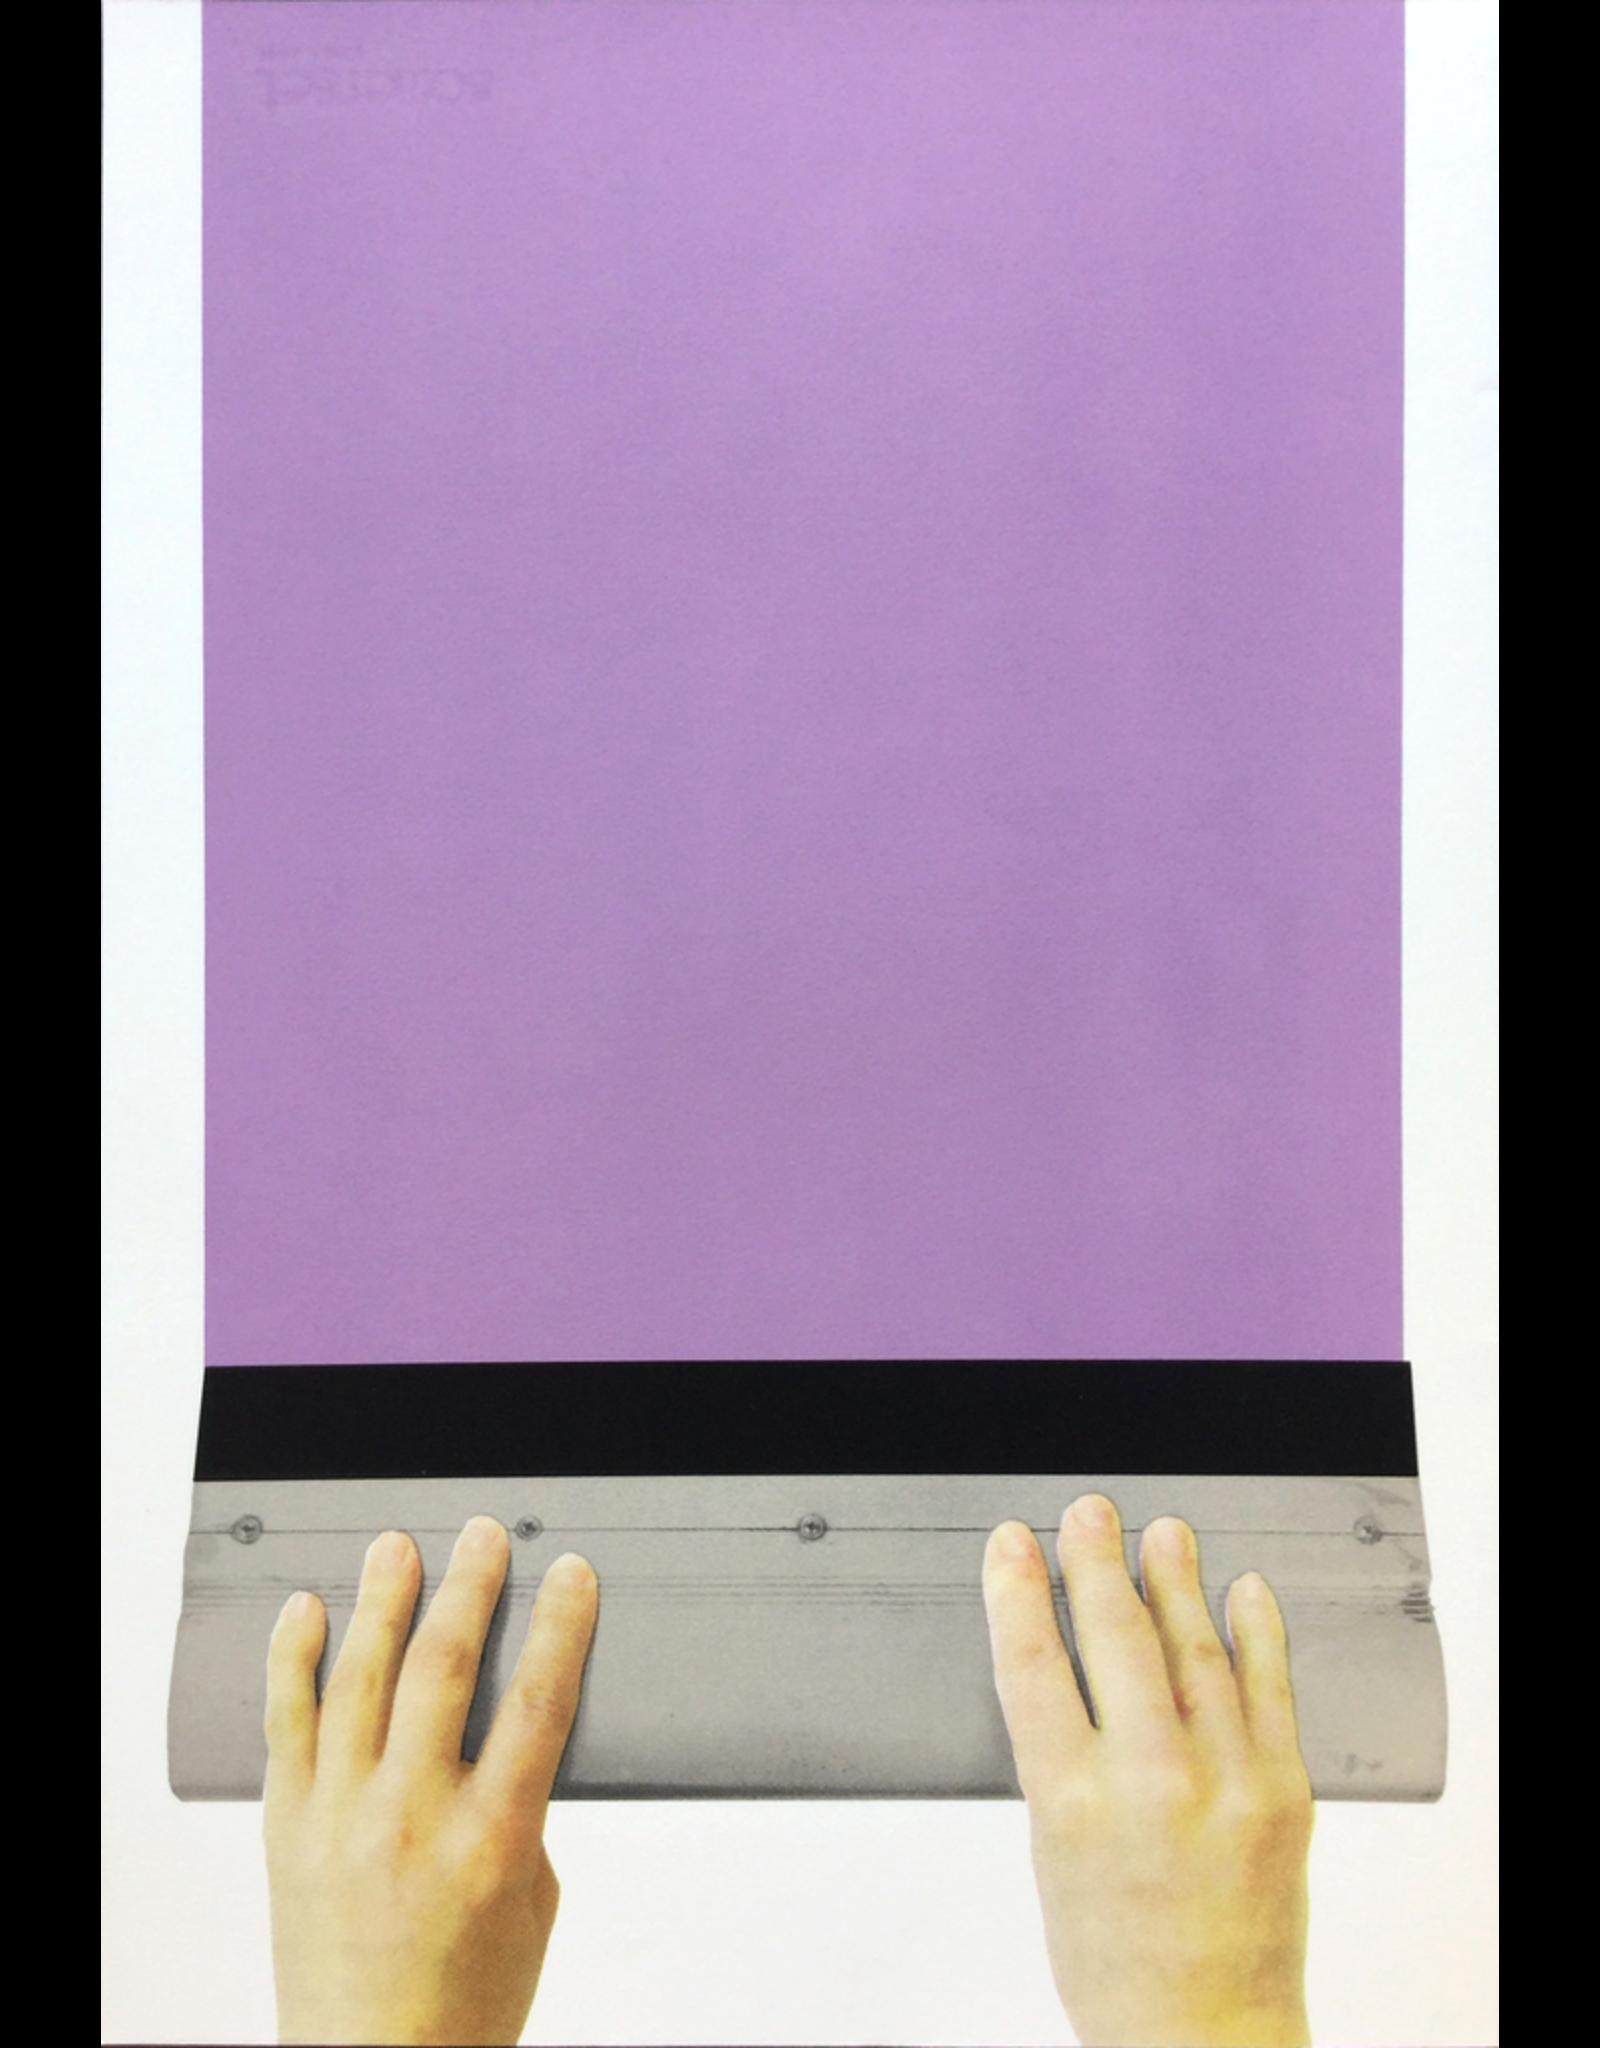 Smith, Suzie Screenprint-Screenprint, Suzie Smith